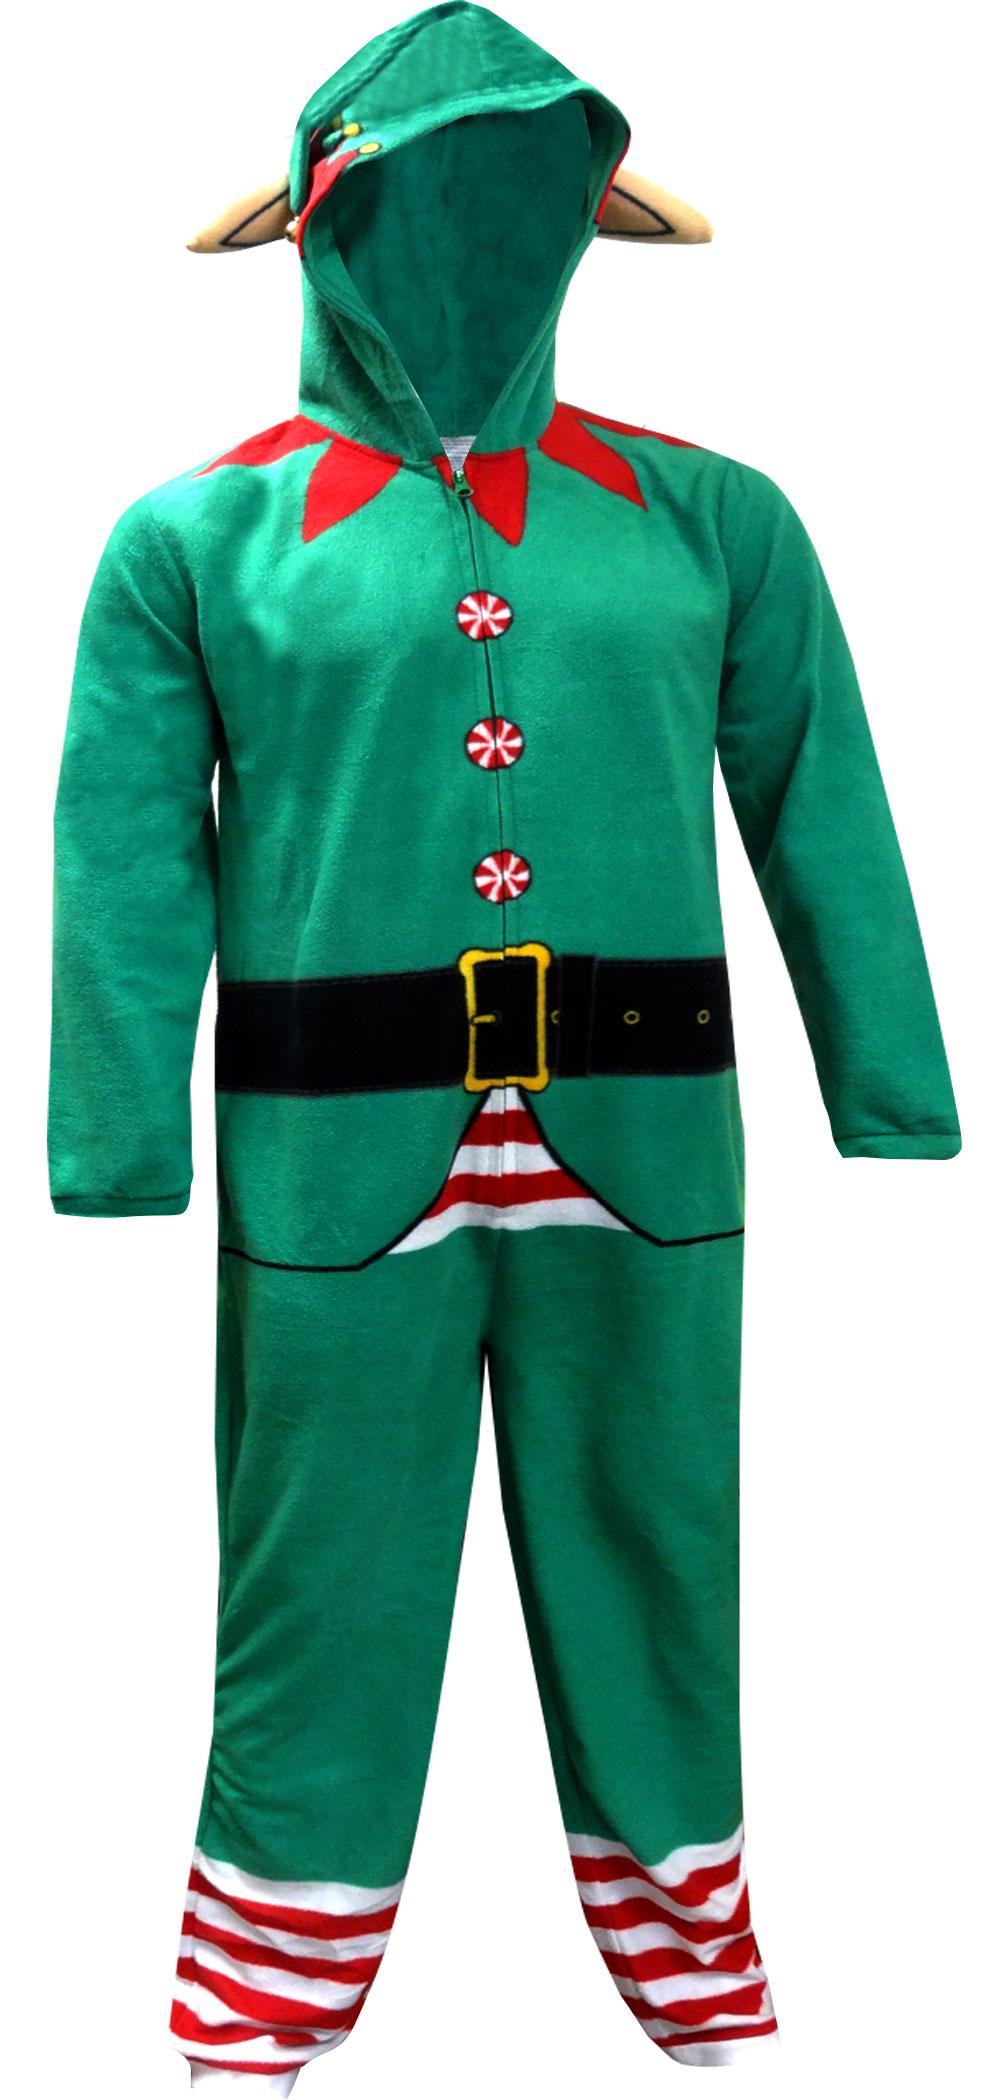 Image of Christmas Elf Onesie Hooded Union Suit Pajama for men